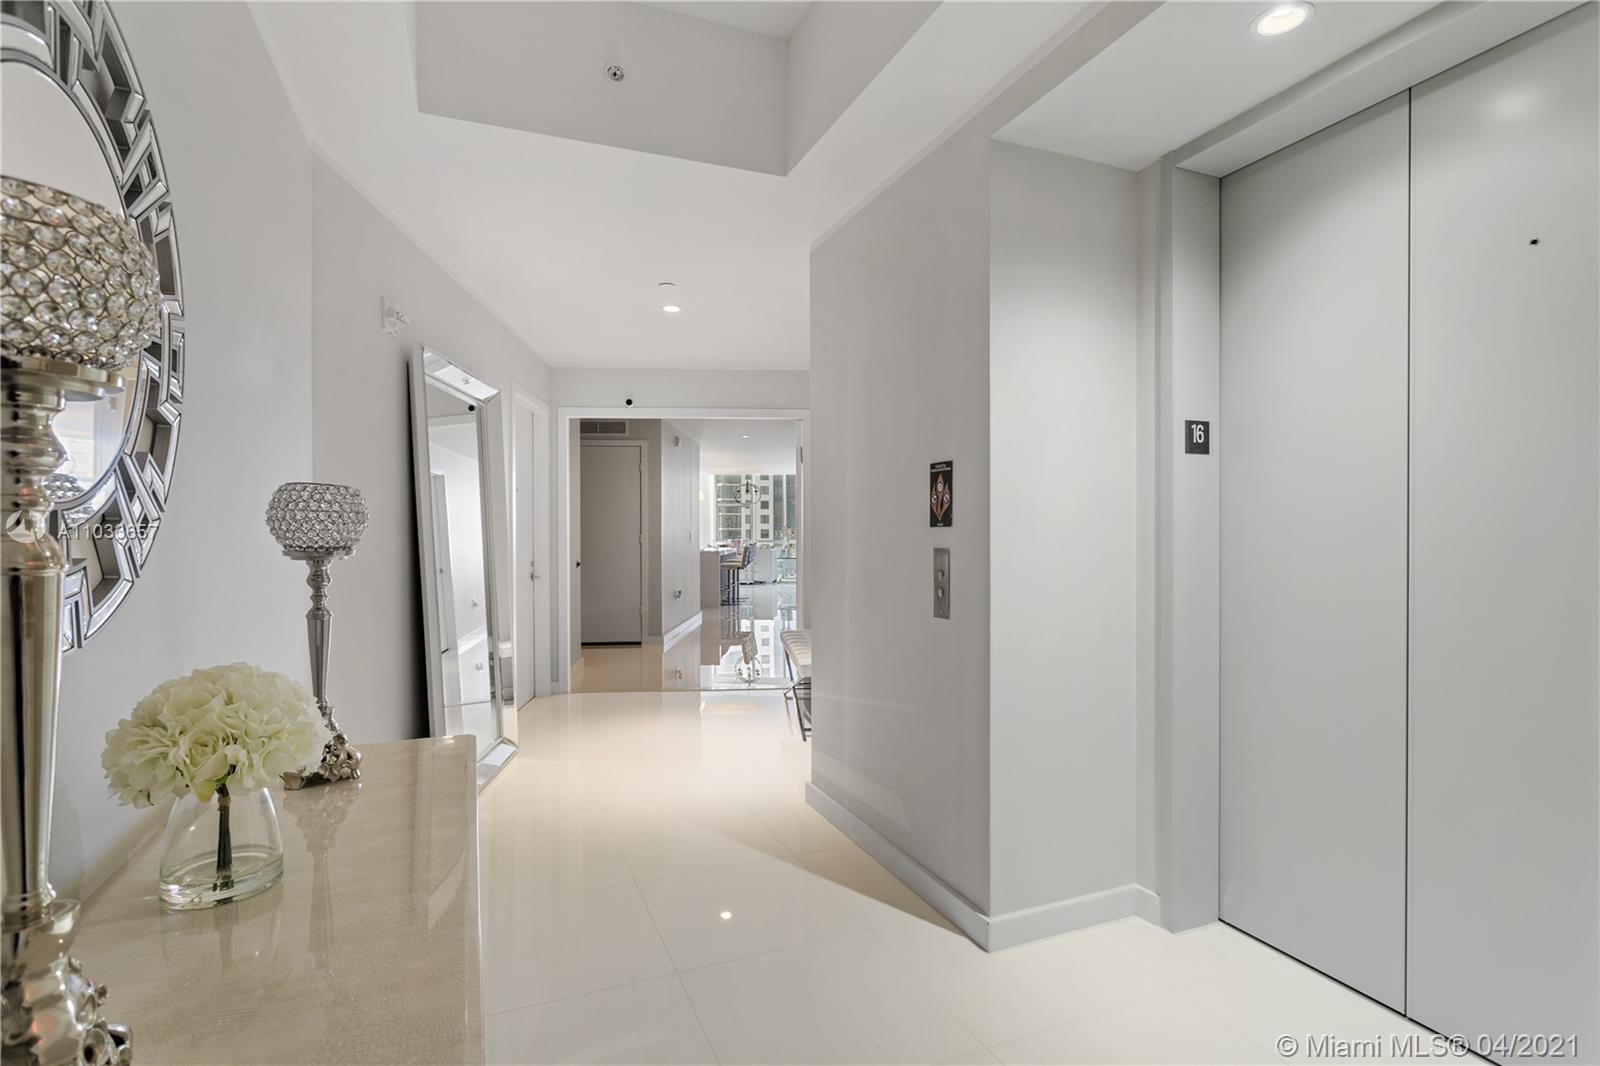 Live in the most attractive building in Miami, Paramount, Miami's new landmark with the most ameniti